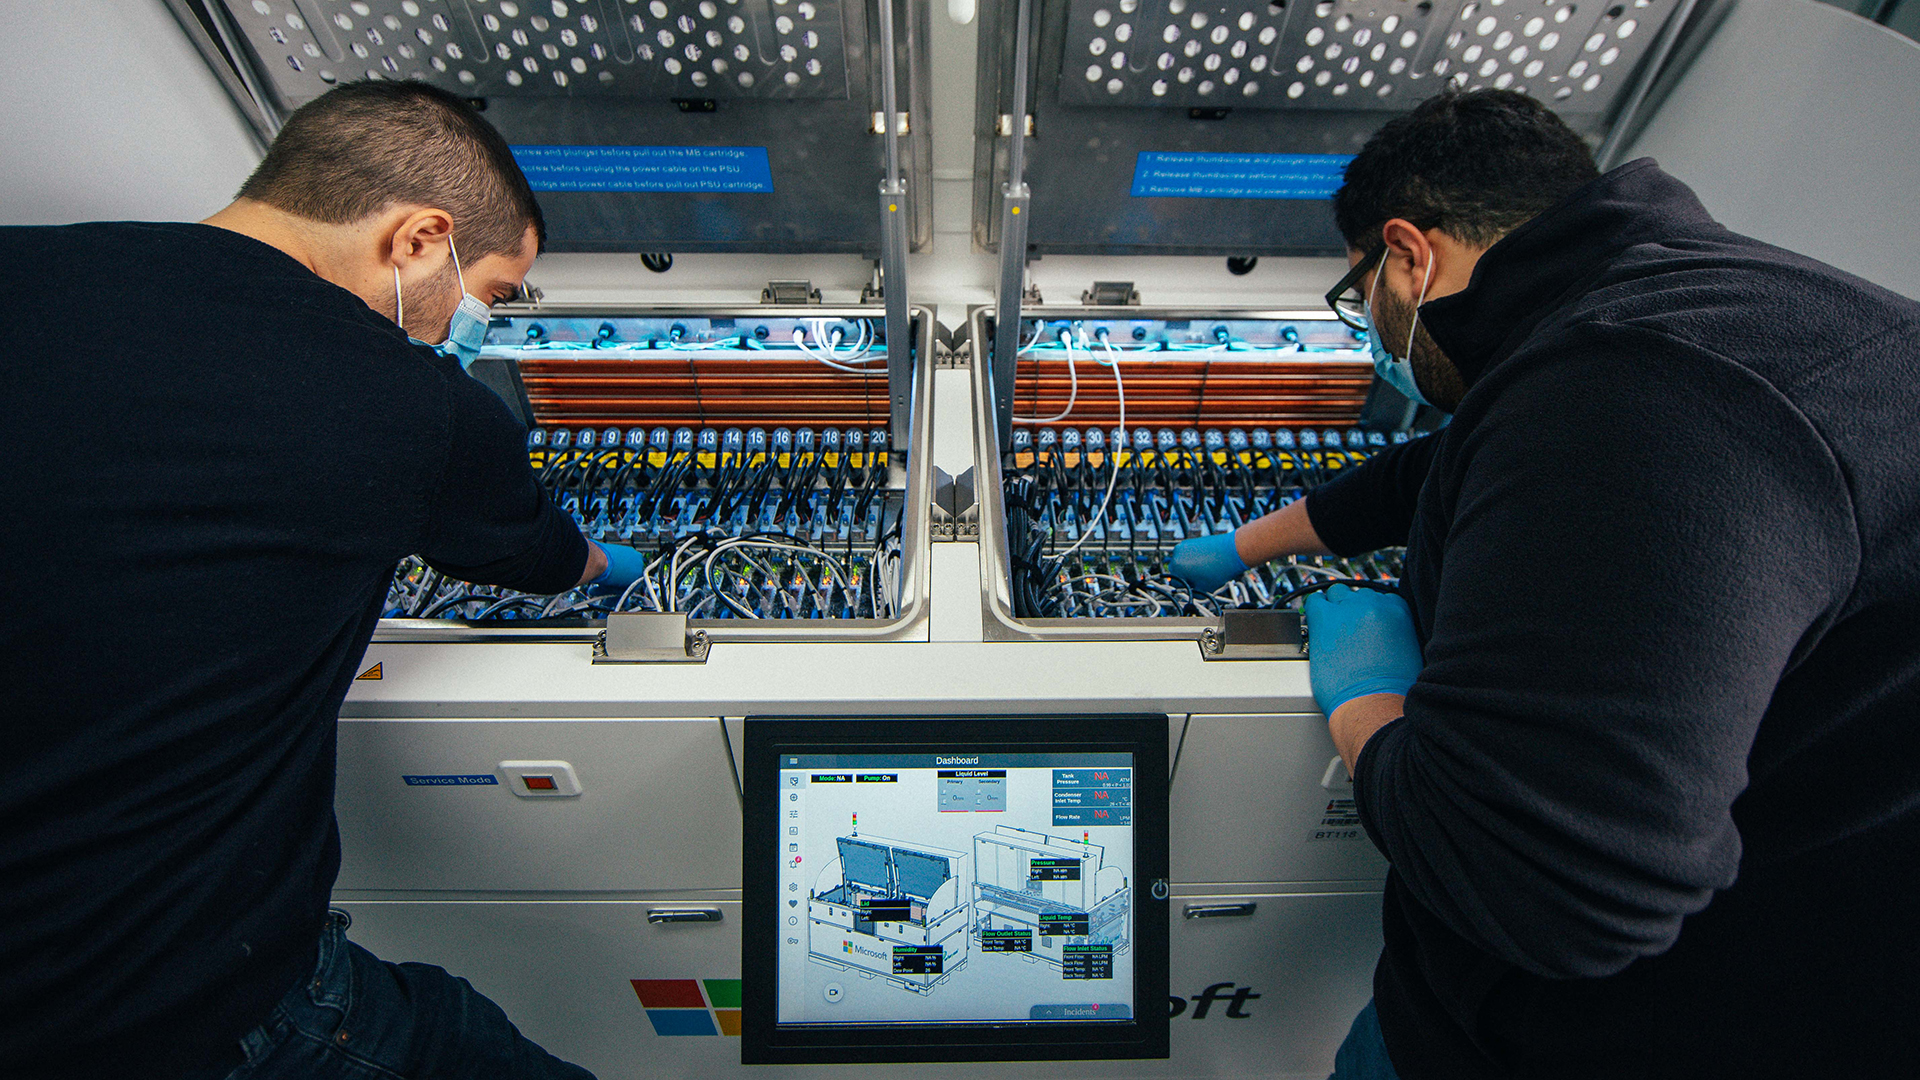 Ioannis Manousakis ، مهندس اصلی نرم افزار با Azure (چپ) ، و Husam Alissa ، مهندس اصلی سخت افزار در تیم Microsoft برای توسعه پیشرفته مرکز داده (سمت راست).